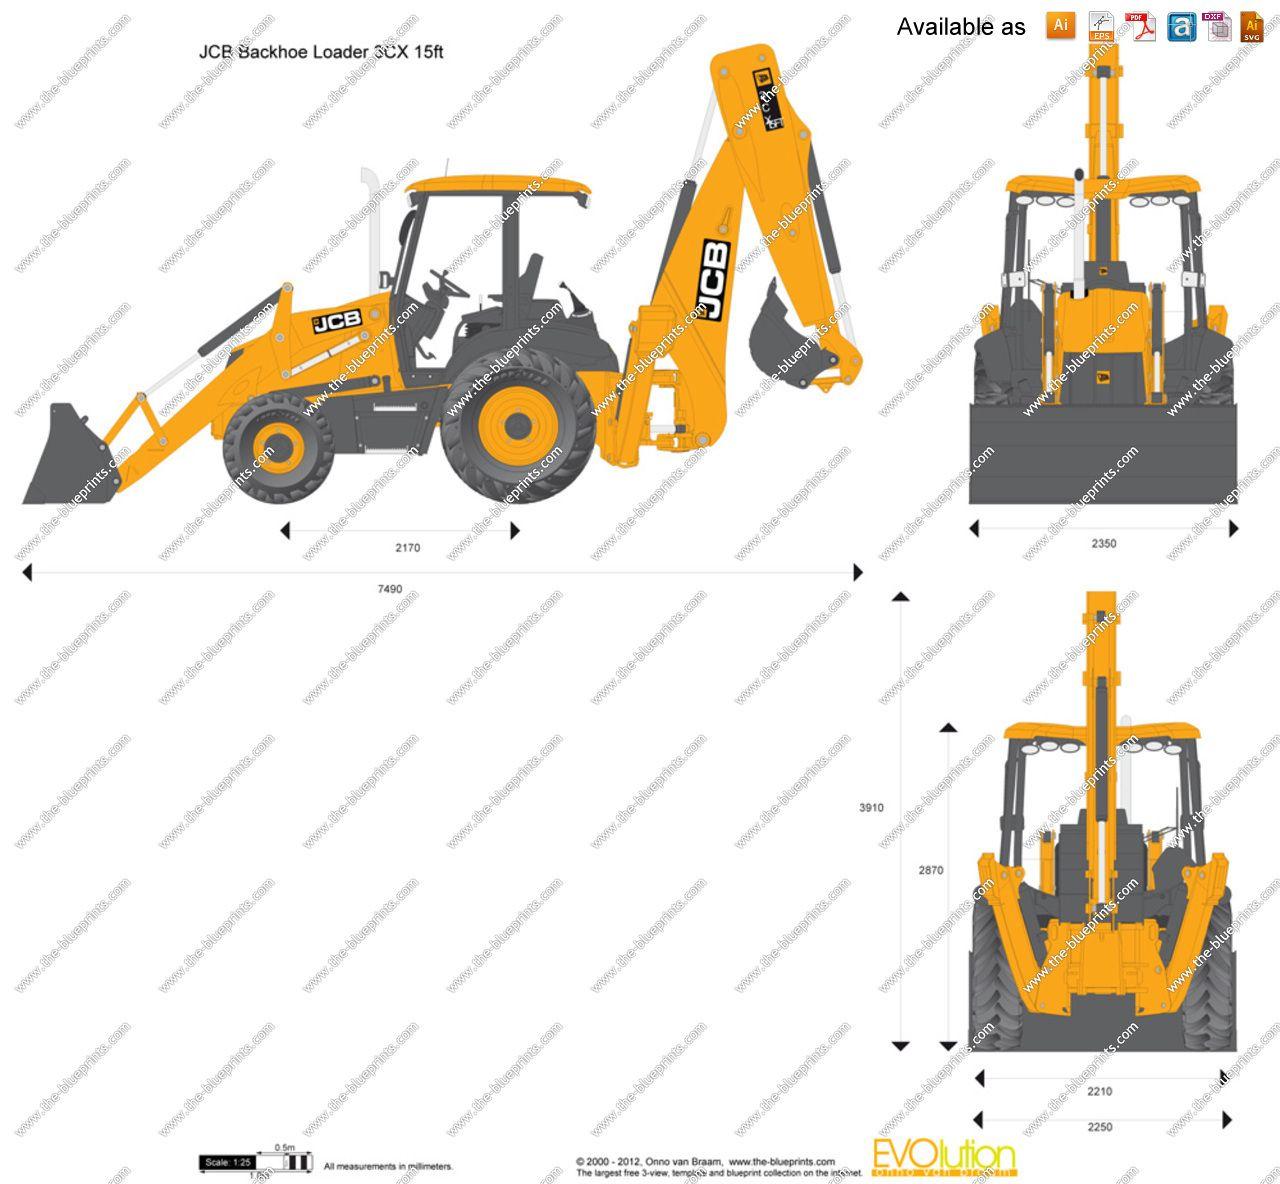 JCB 3CX 15ft Backhoe Loader | civil construction equipment